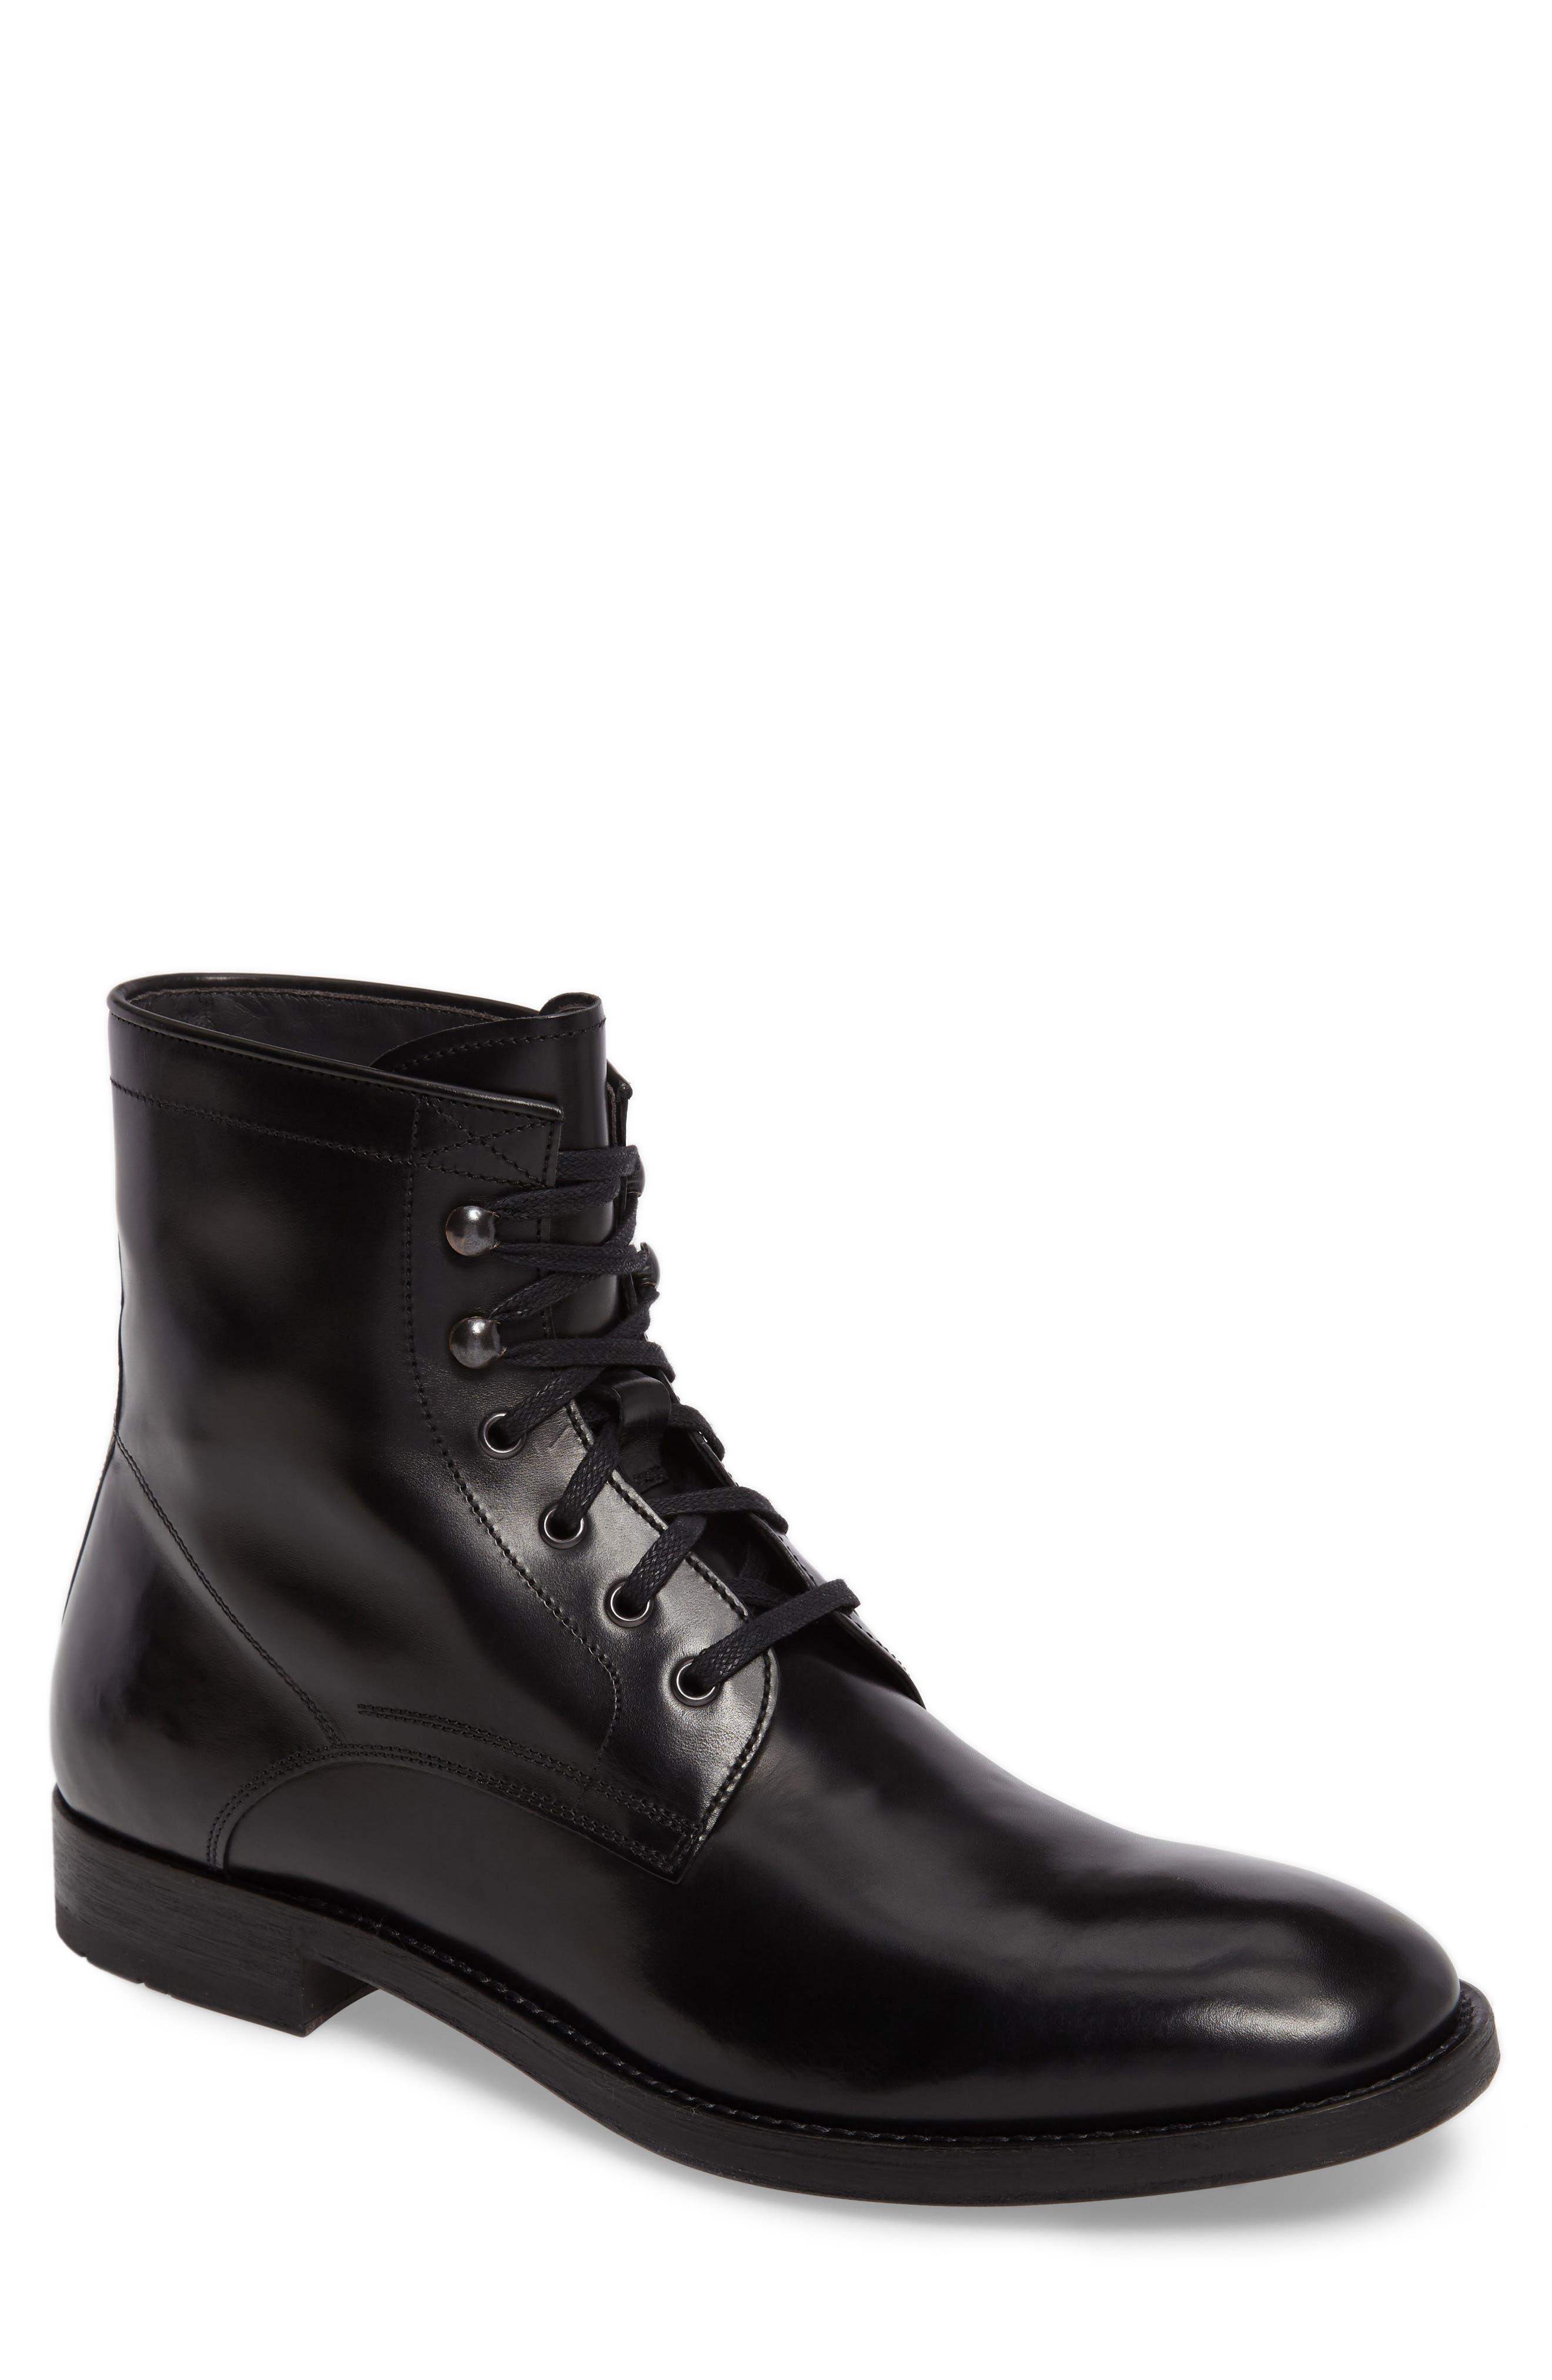 Astoria Plain Toe Boot,                             Main thumbnail 1, color,